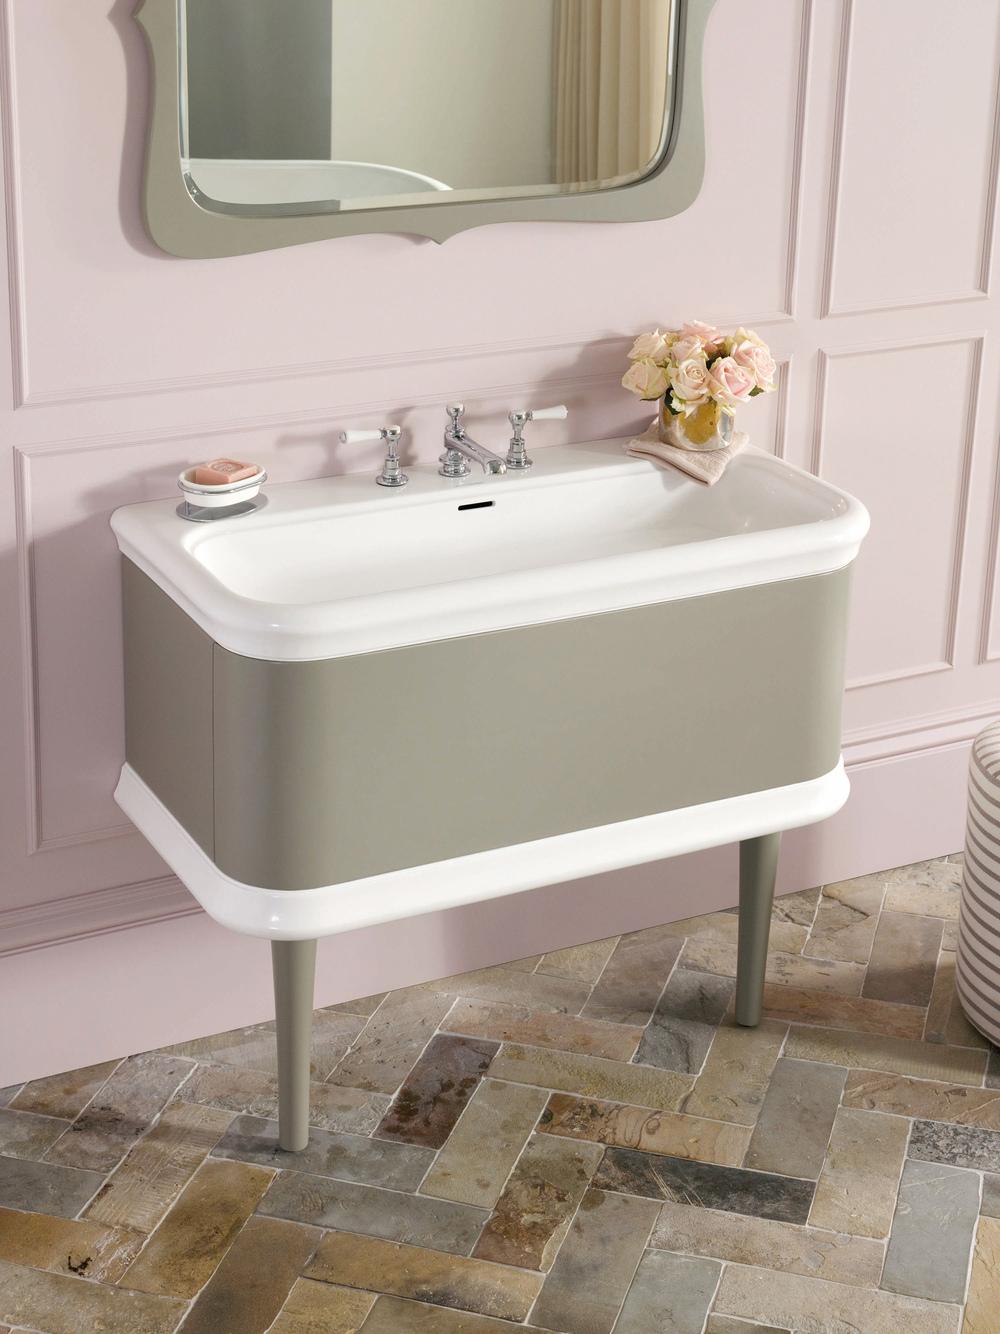 Lario Vanity, designed by Meneghello Paolelli Associati for V+A Baths | Photo courtesy V+A Baths